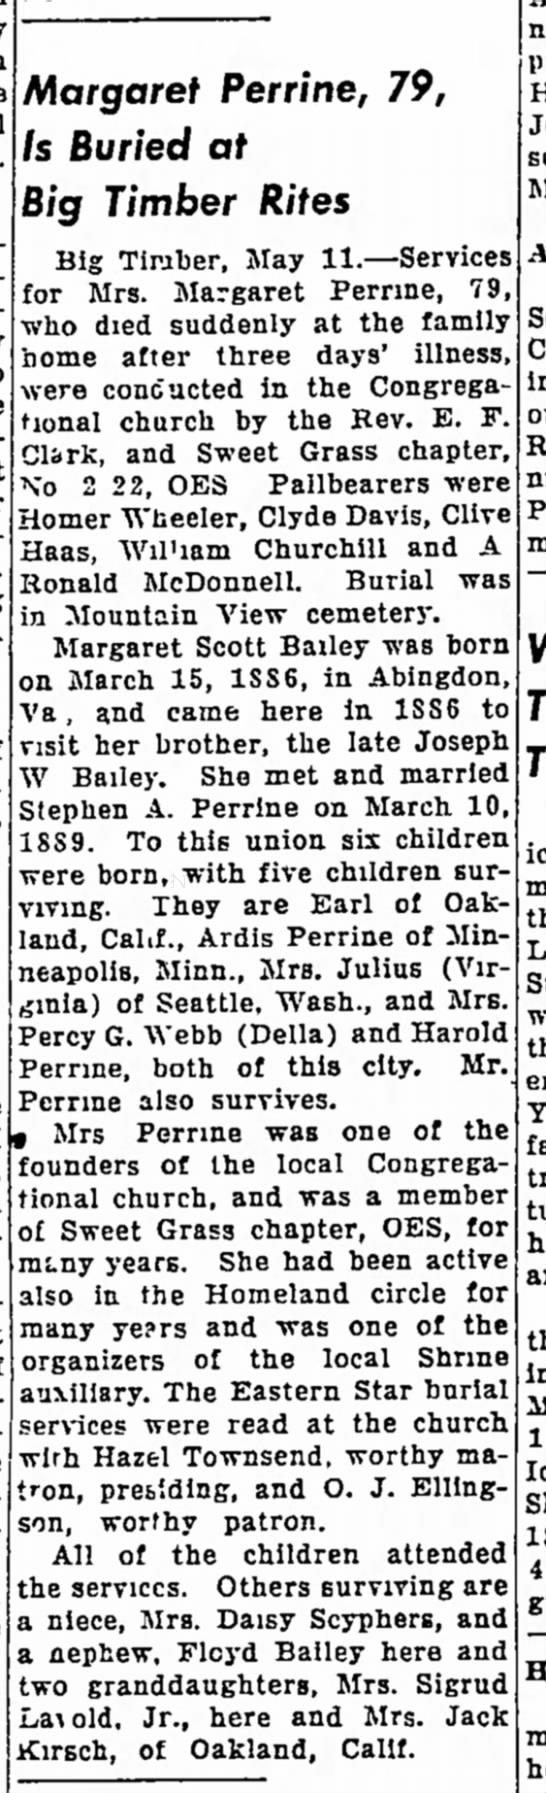 Margaret Scott (BAILEY) PERRINE obituary, 1946, Big Timber, MT.